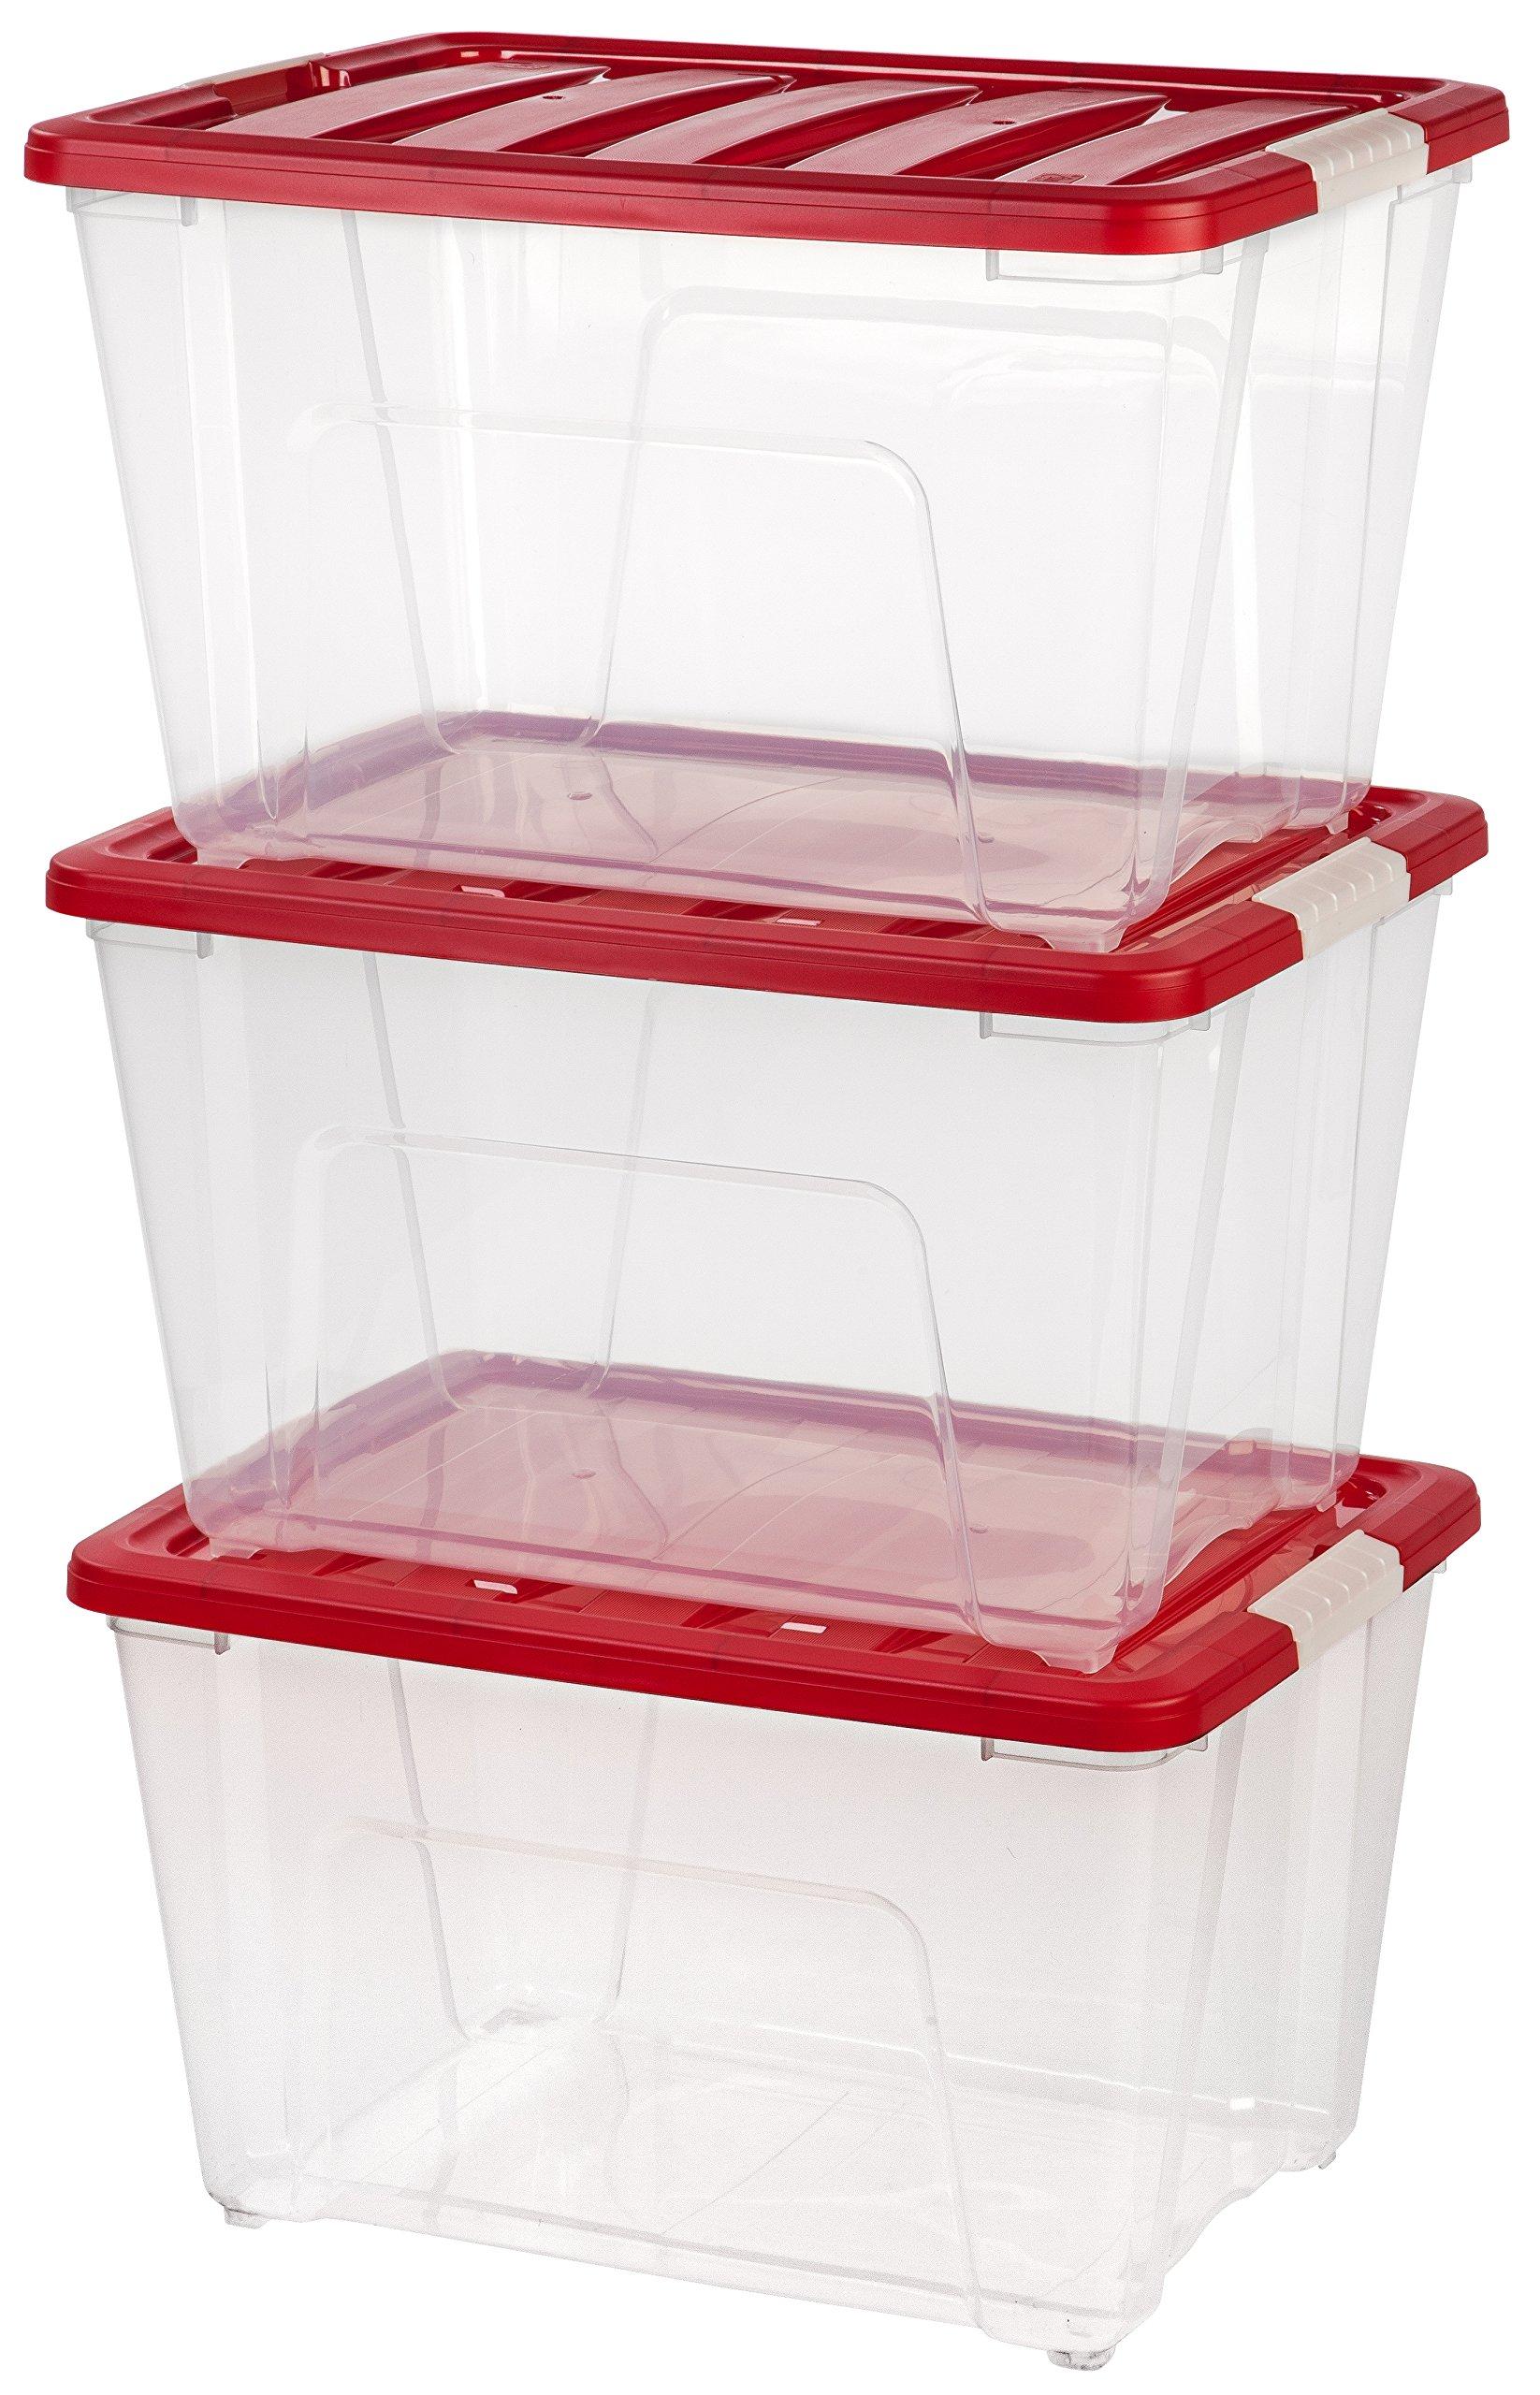 IRIS 53 Quart Holiday Plastic Storage Tote Set, 3 Pack, Red